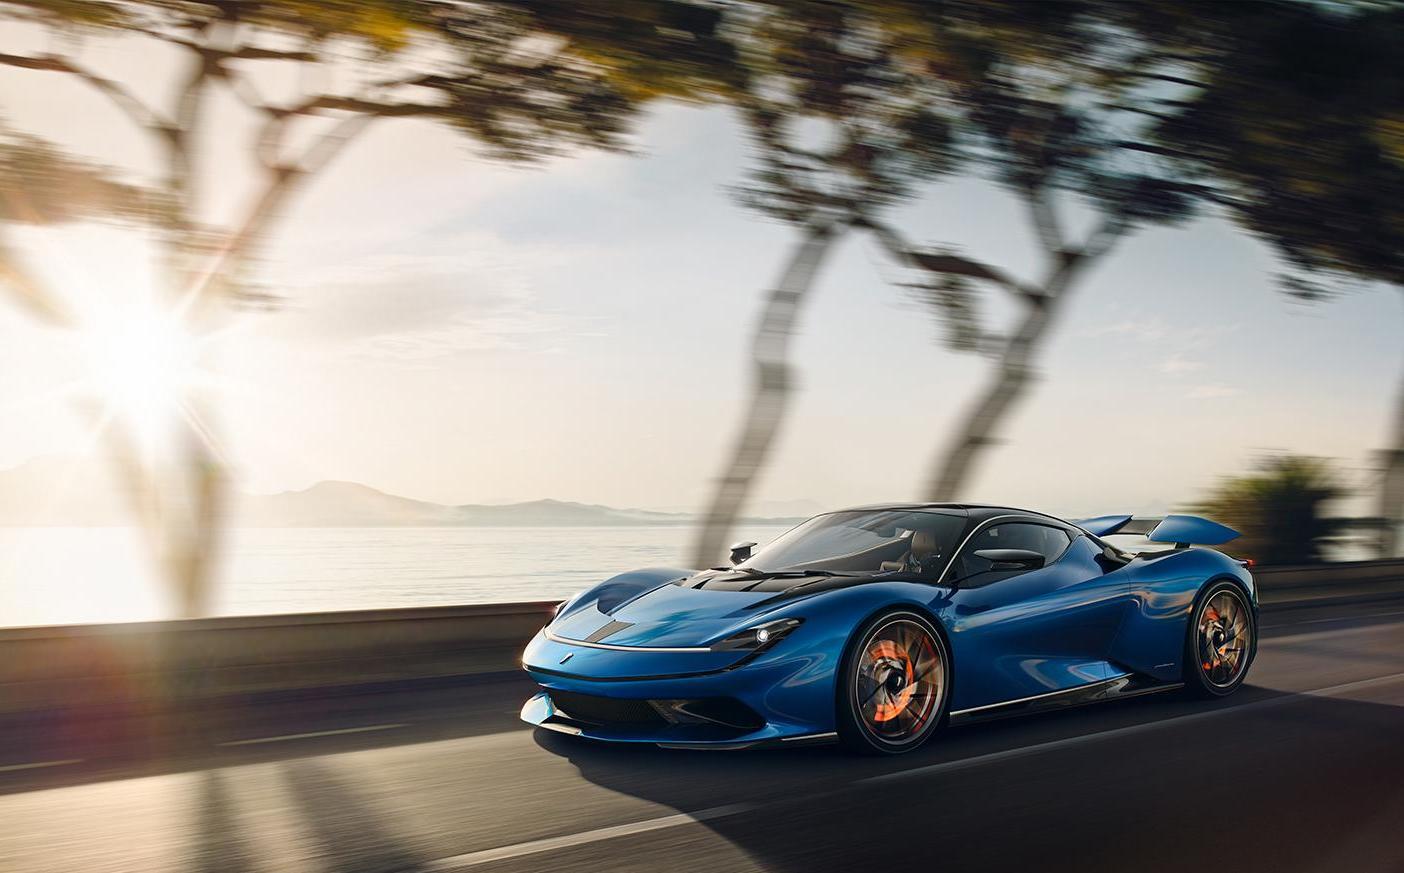 A sporty modern electric car